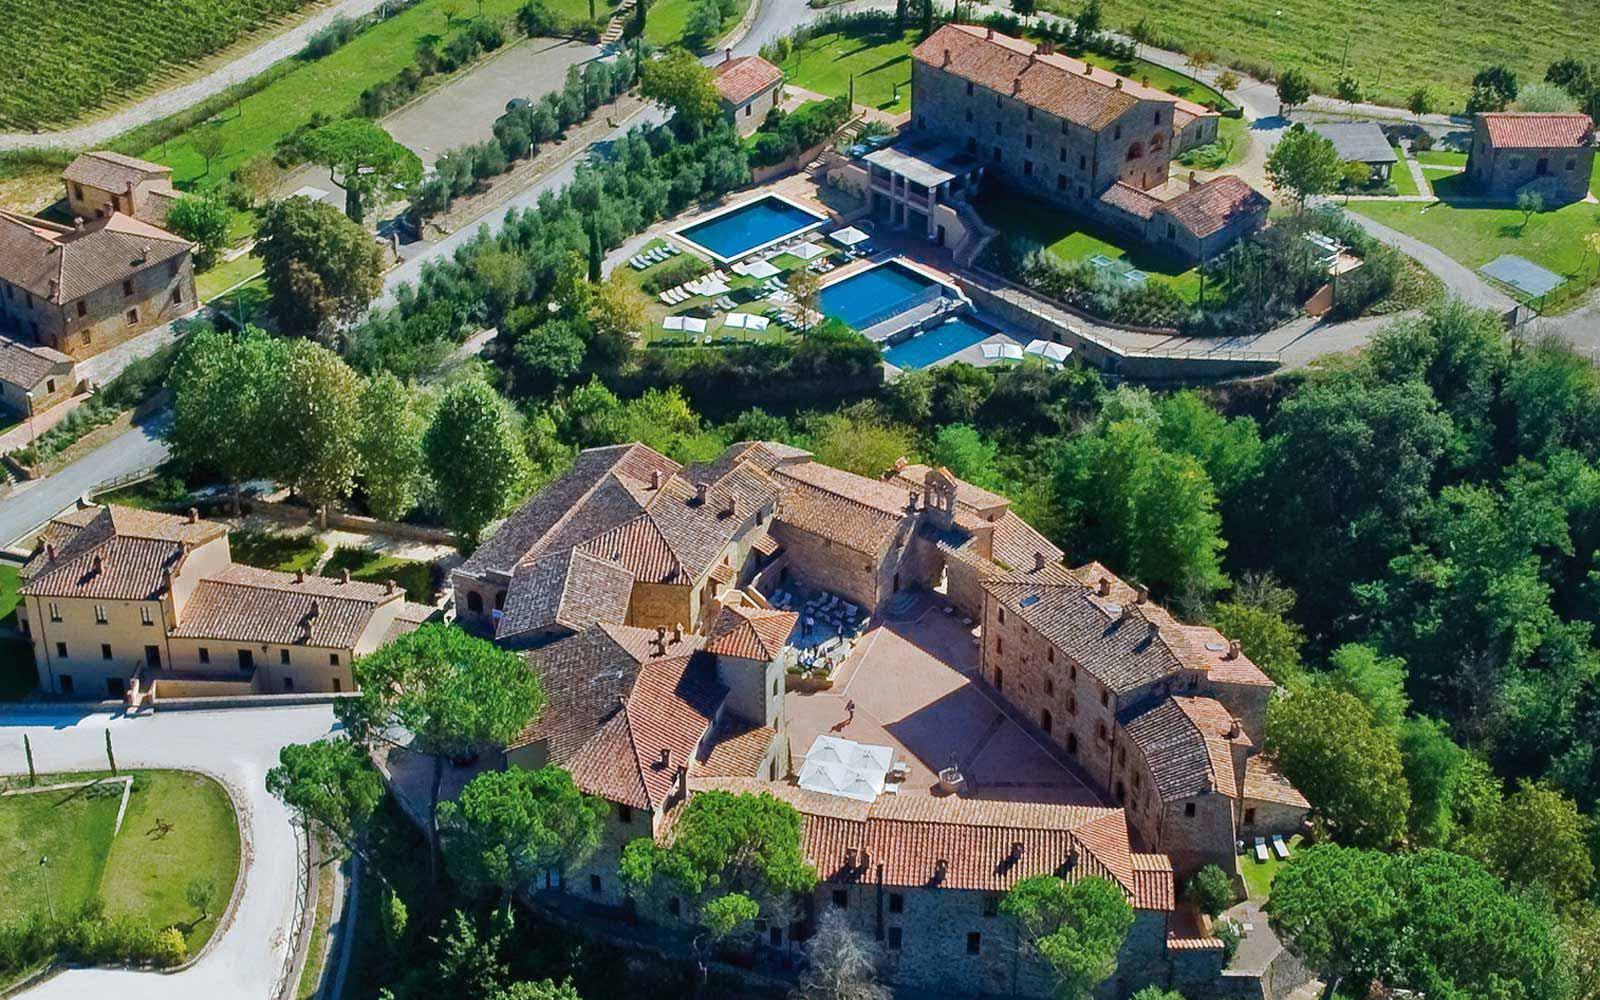 Aerial View of Castel Monastero Tuscan Resort & Spa